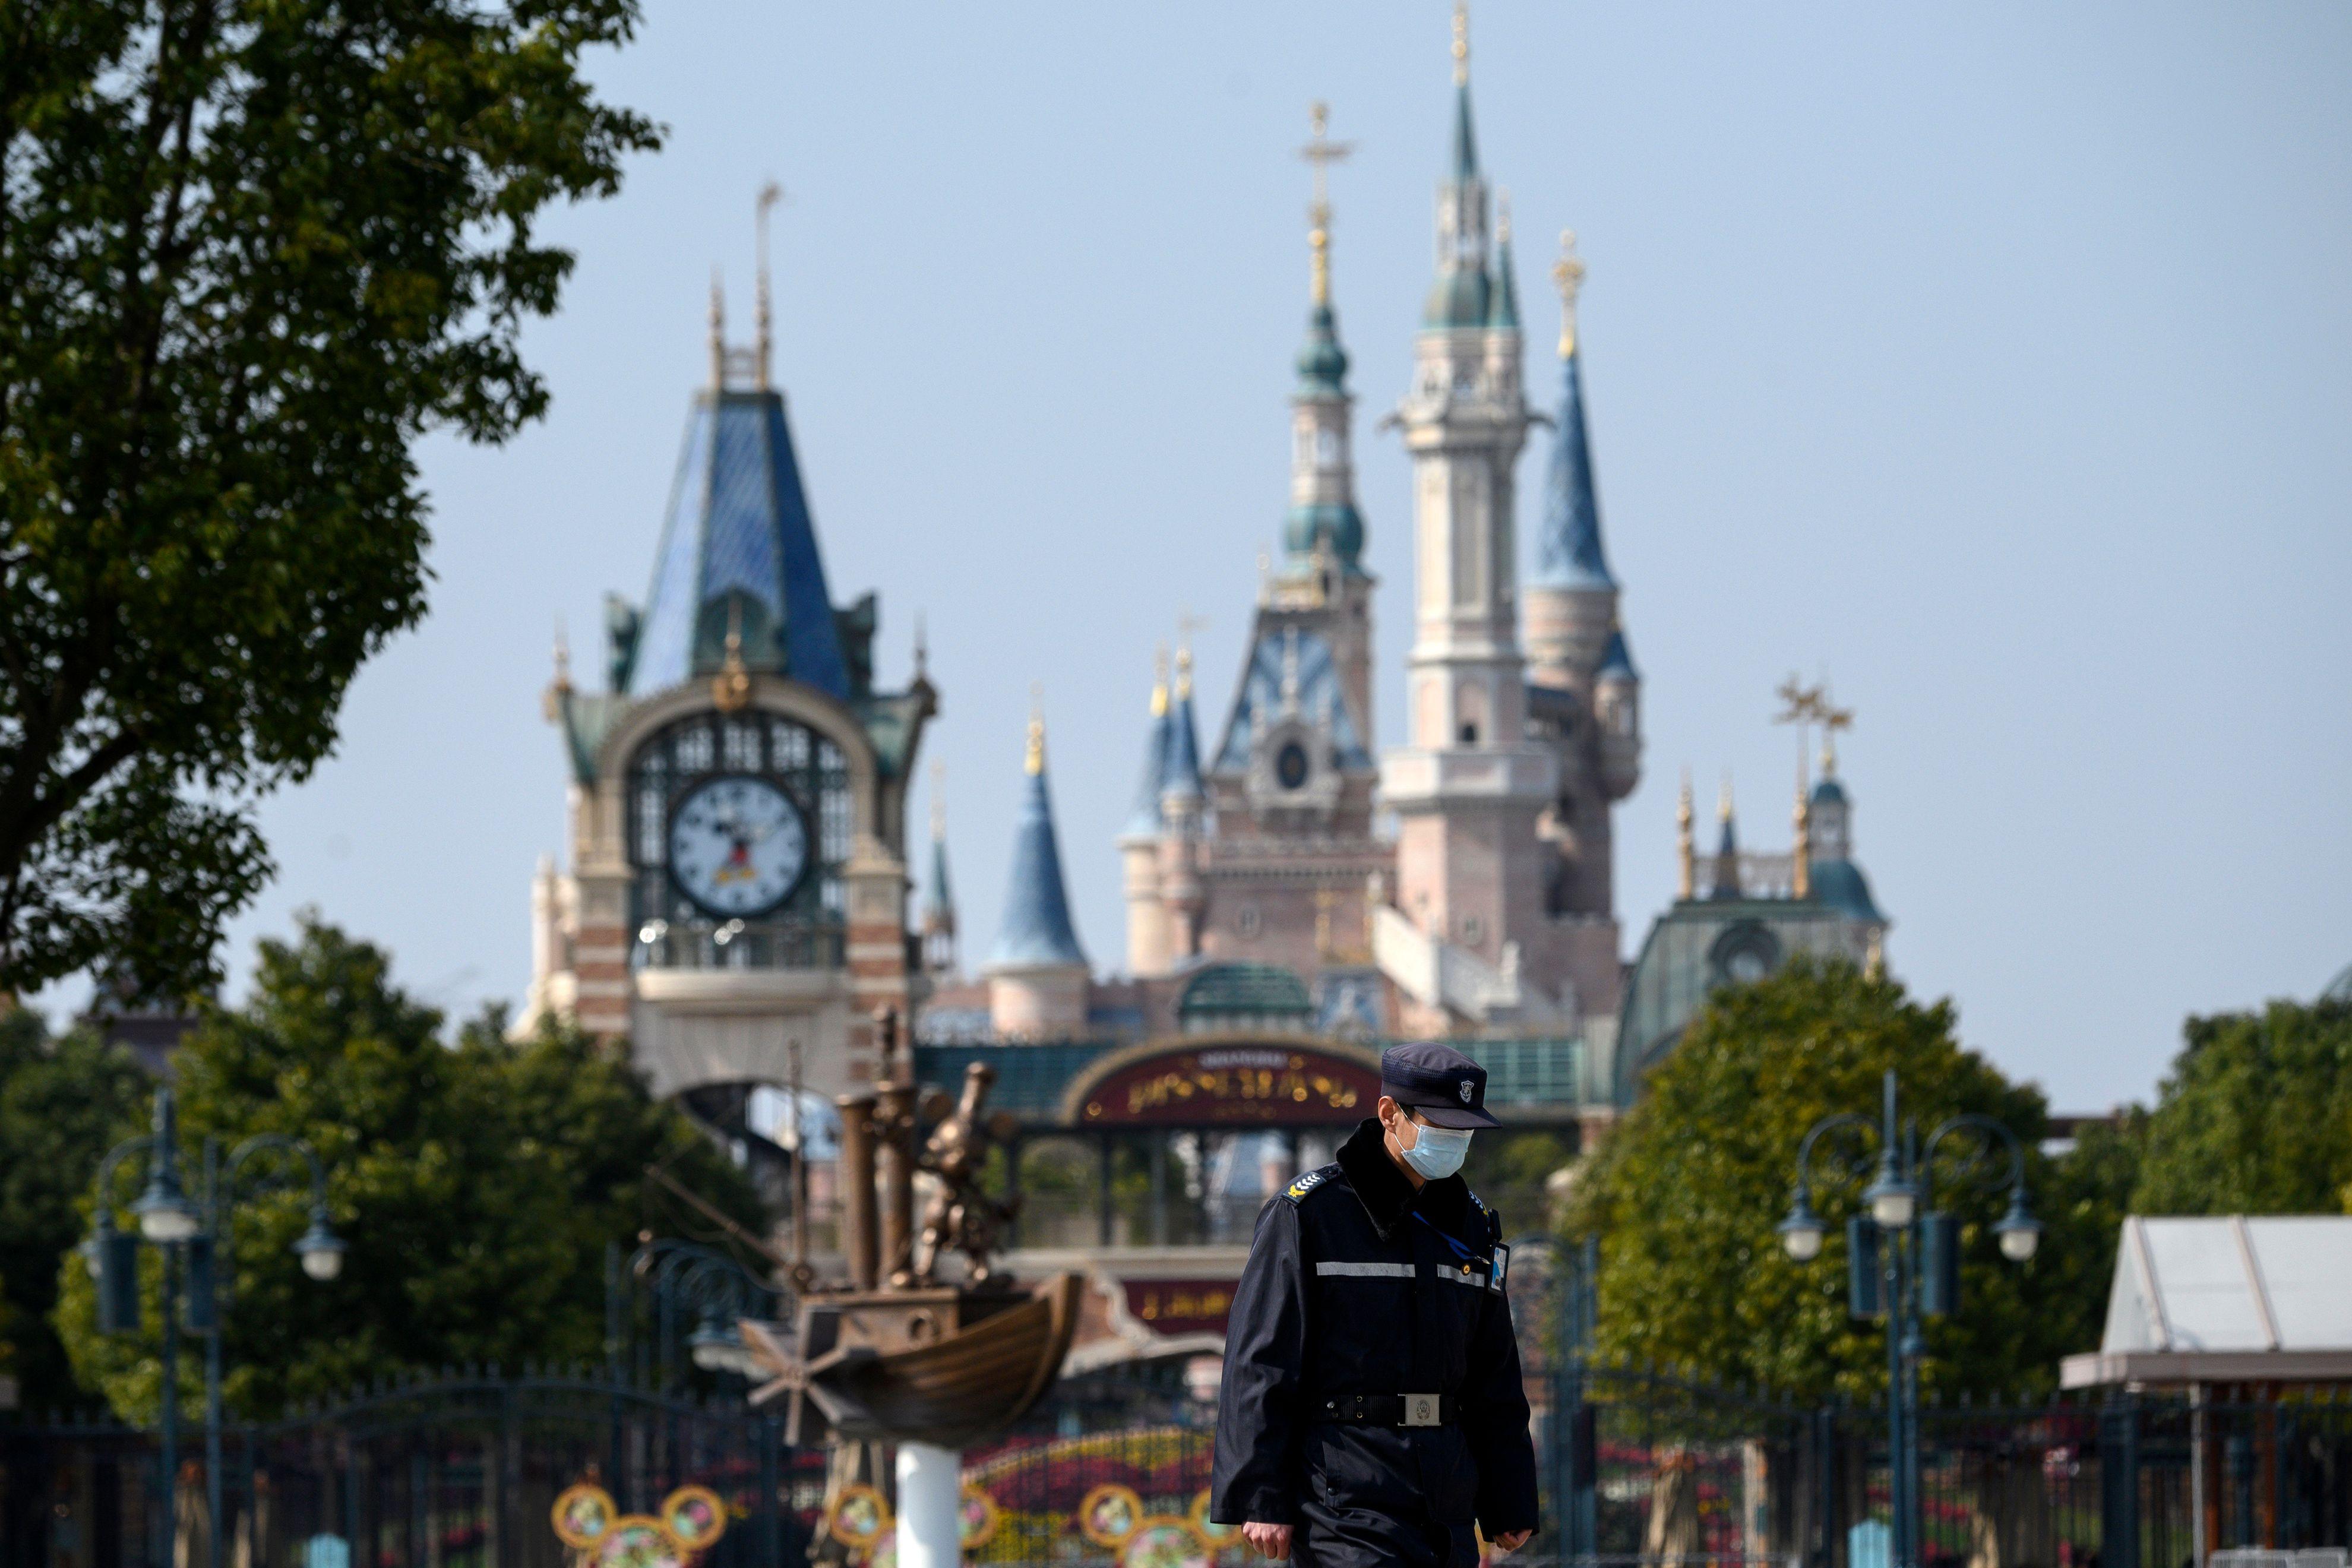 Coronavirus lockdown turns Disney theme parks into ghost towns ...